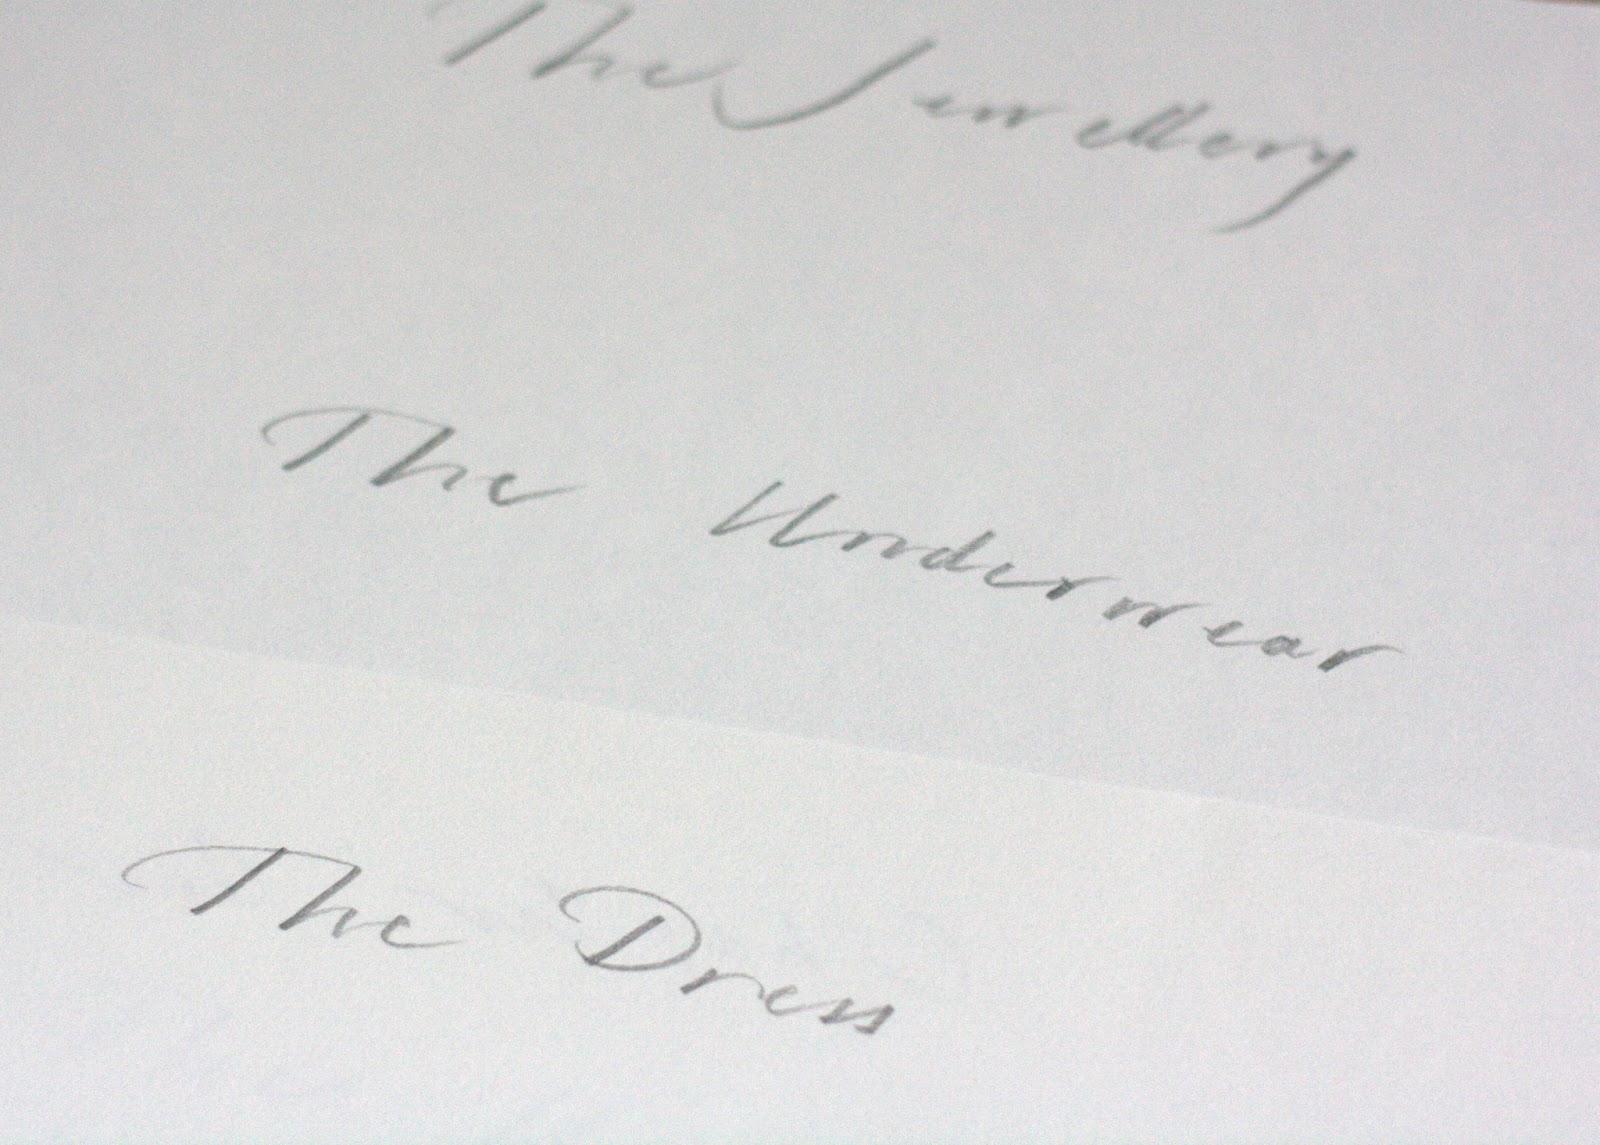 Lucy Each Peach Pear Plum And Some Elegant Handwriting